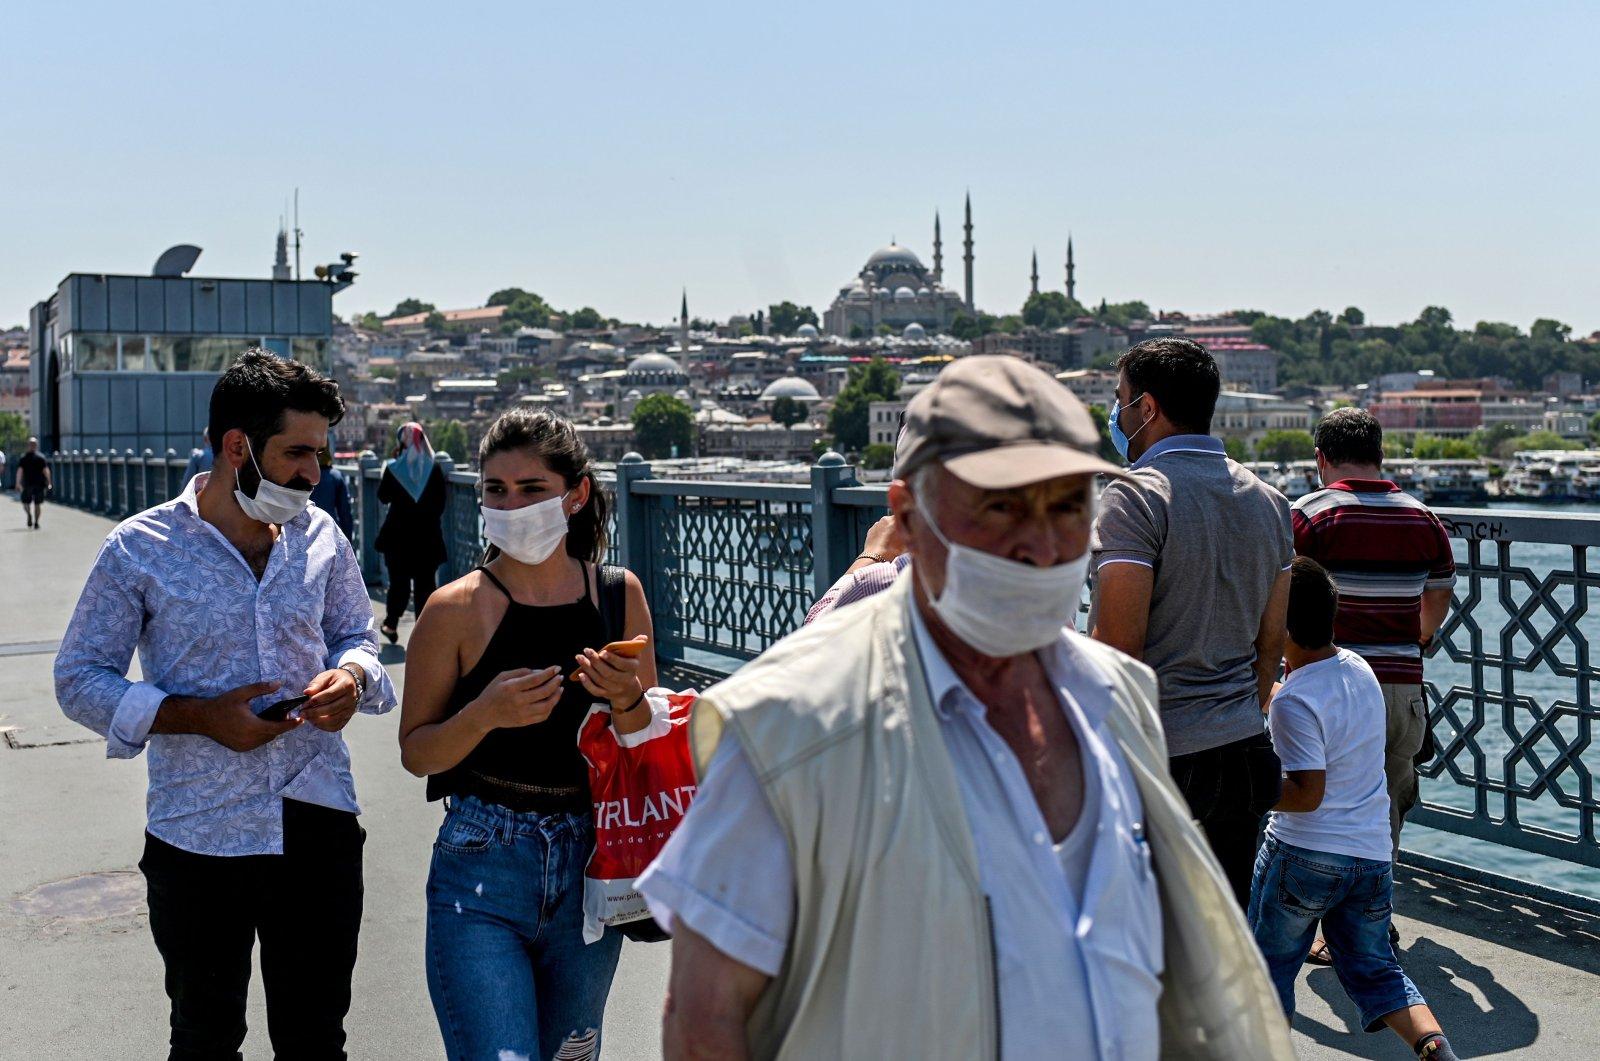 People wearing protective face masks walk on the Galata Bridge, Istanbul, Turkey, July 1, 2020. (AFP Photo)